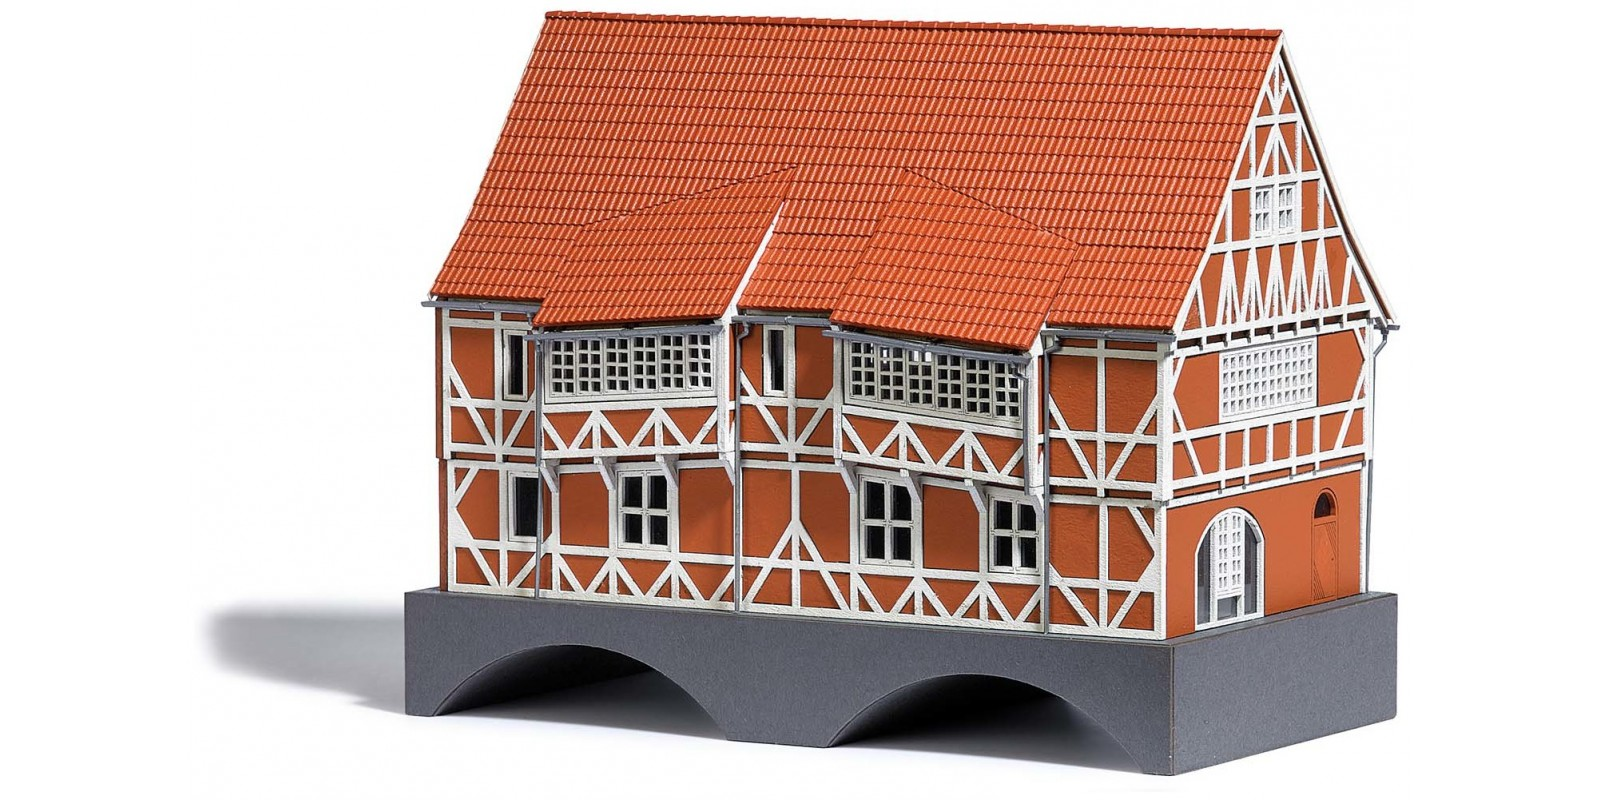 BU1656 Bridge House